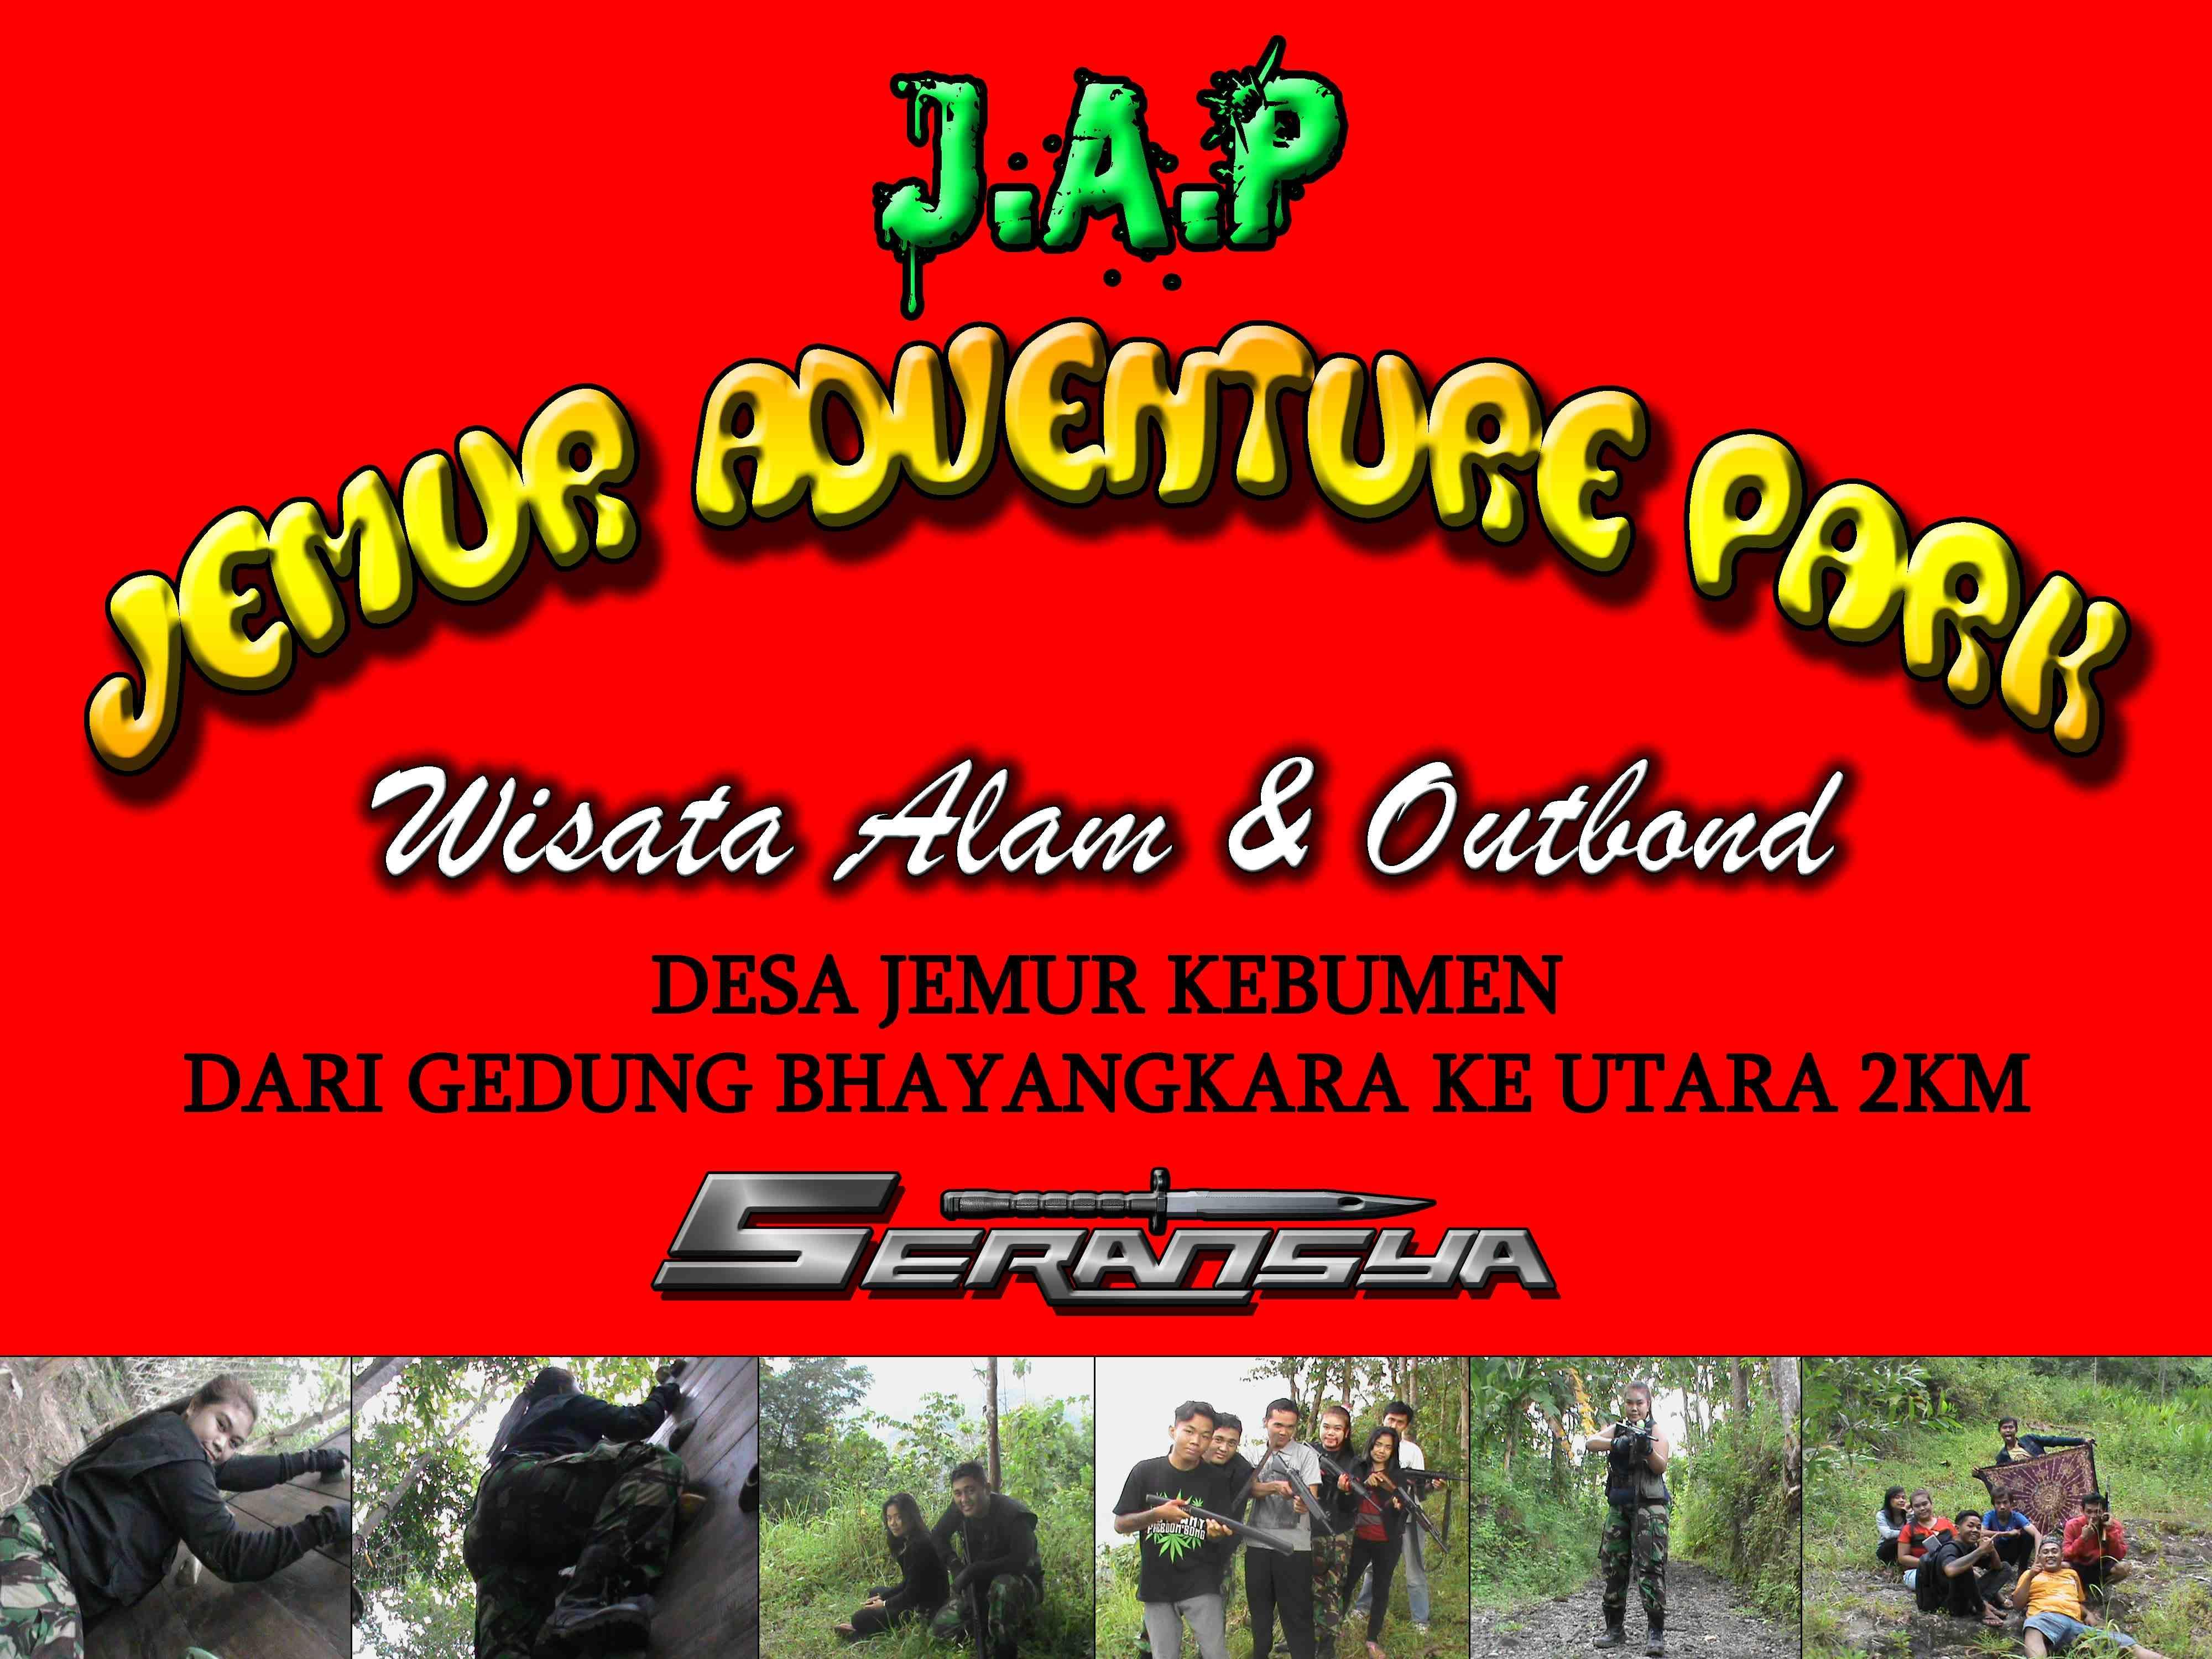 Jemur Adventure Park Wisata Alam Outbond Kebumen Youtube Tegalarum Kab